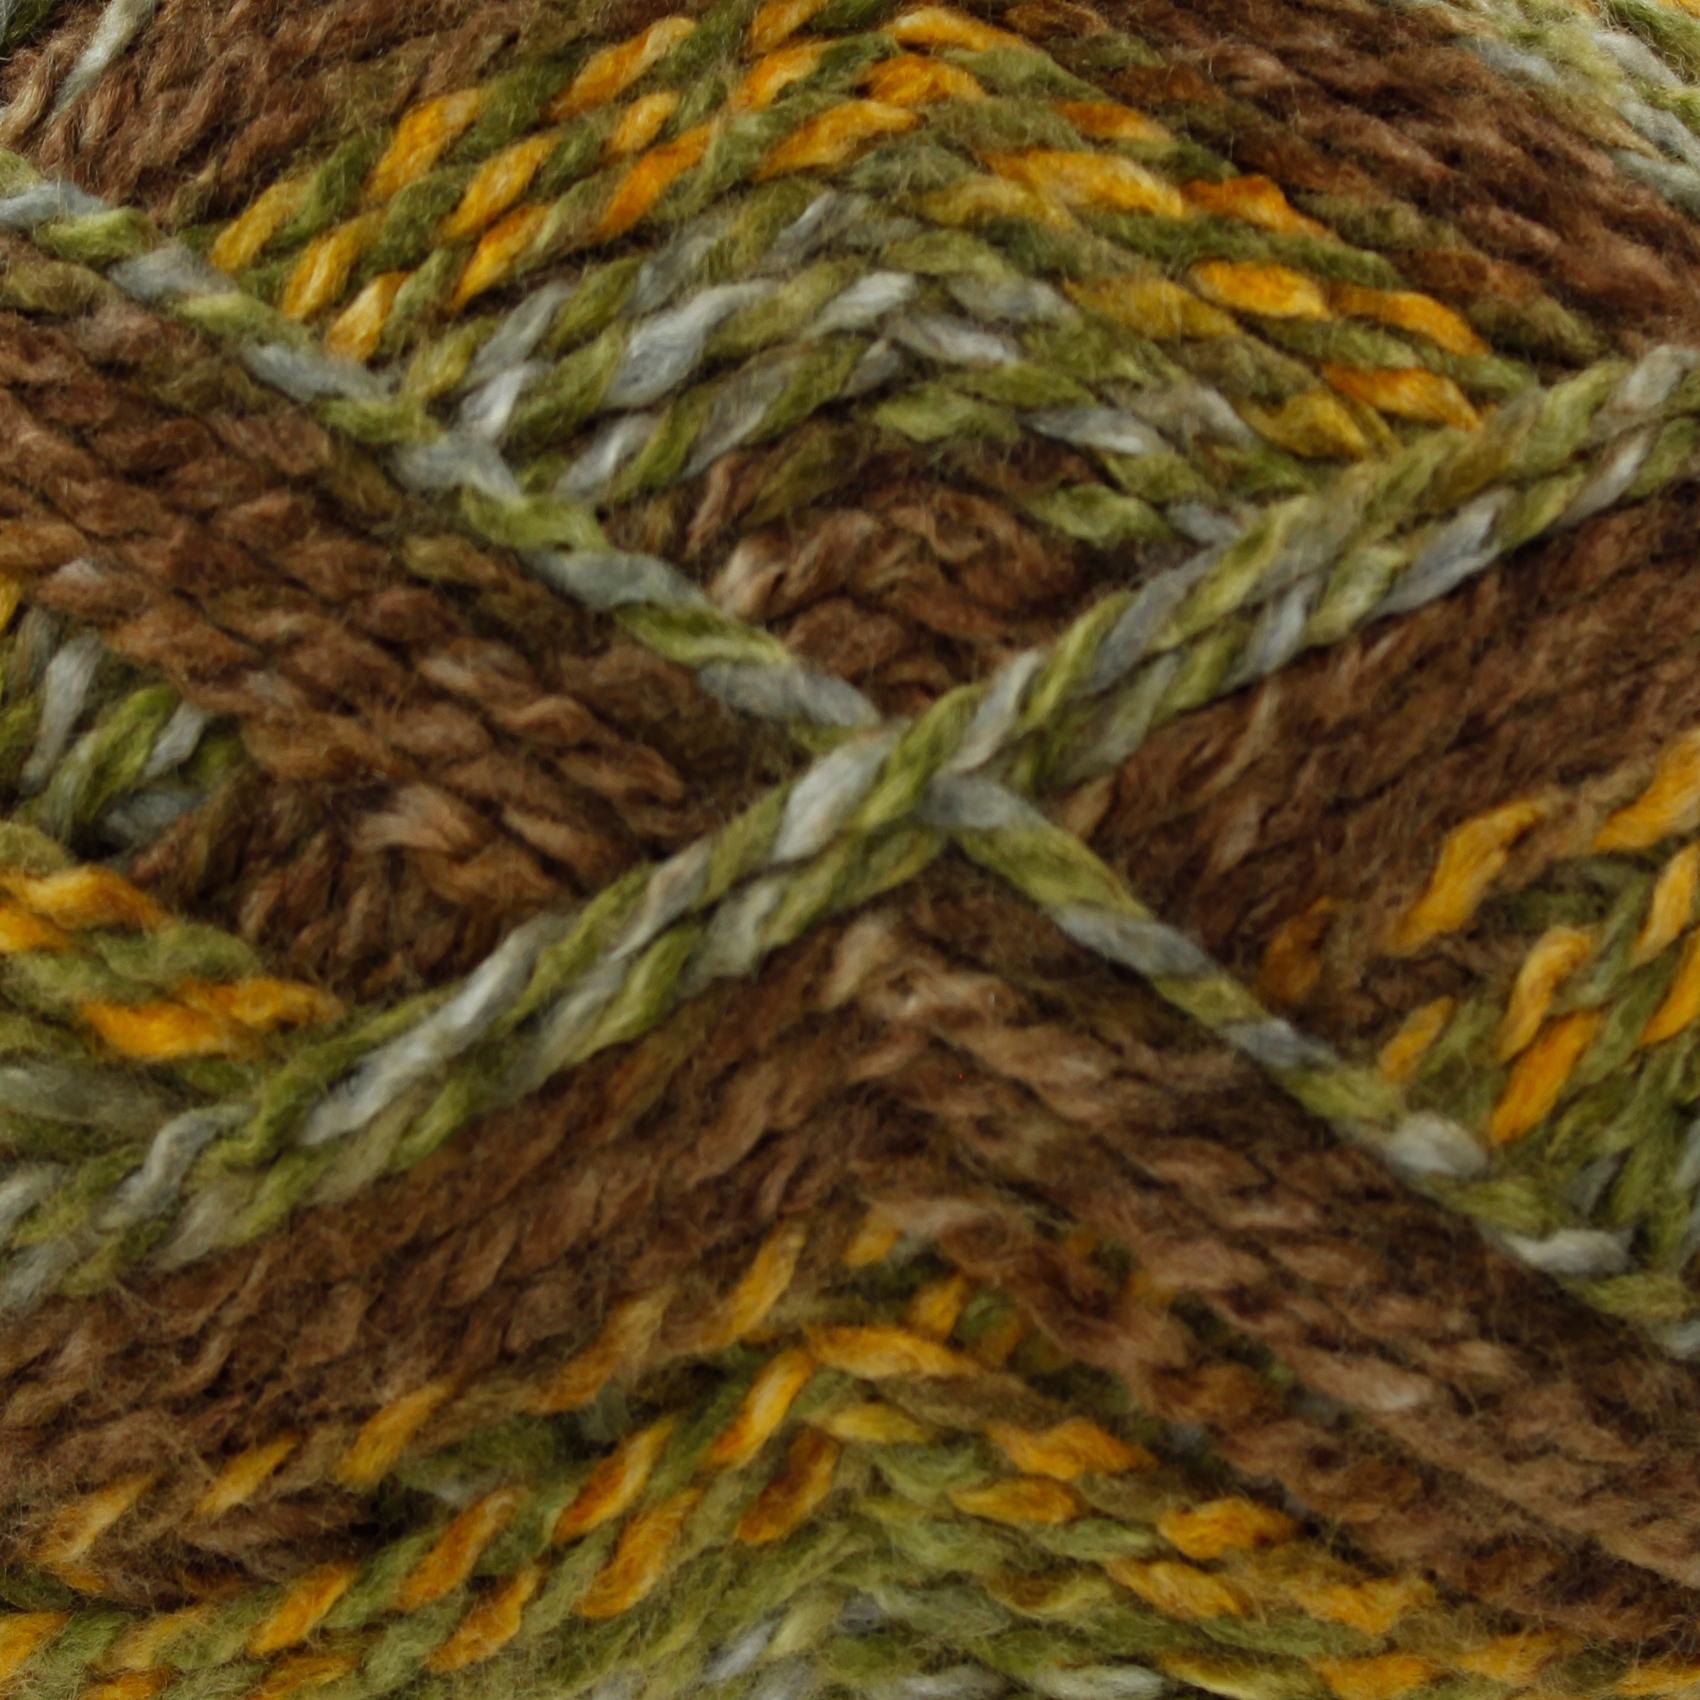 king cole corona grob yarn 100g strick garn acryl wolle packung von 1 3 6 12 ebay. Black Bedroom Furniture Sets. Home Design Ideas